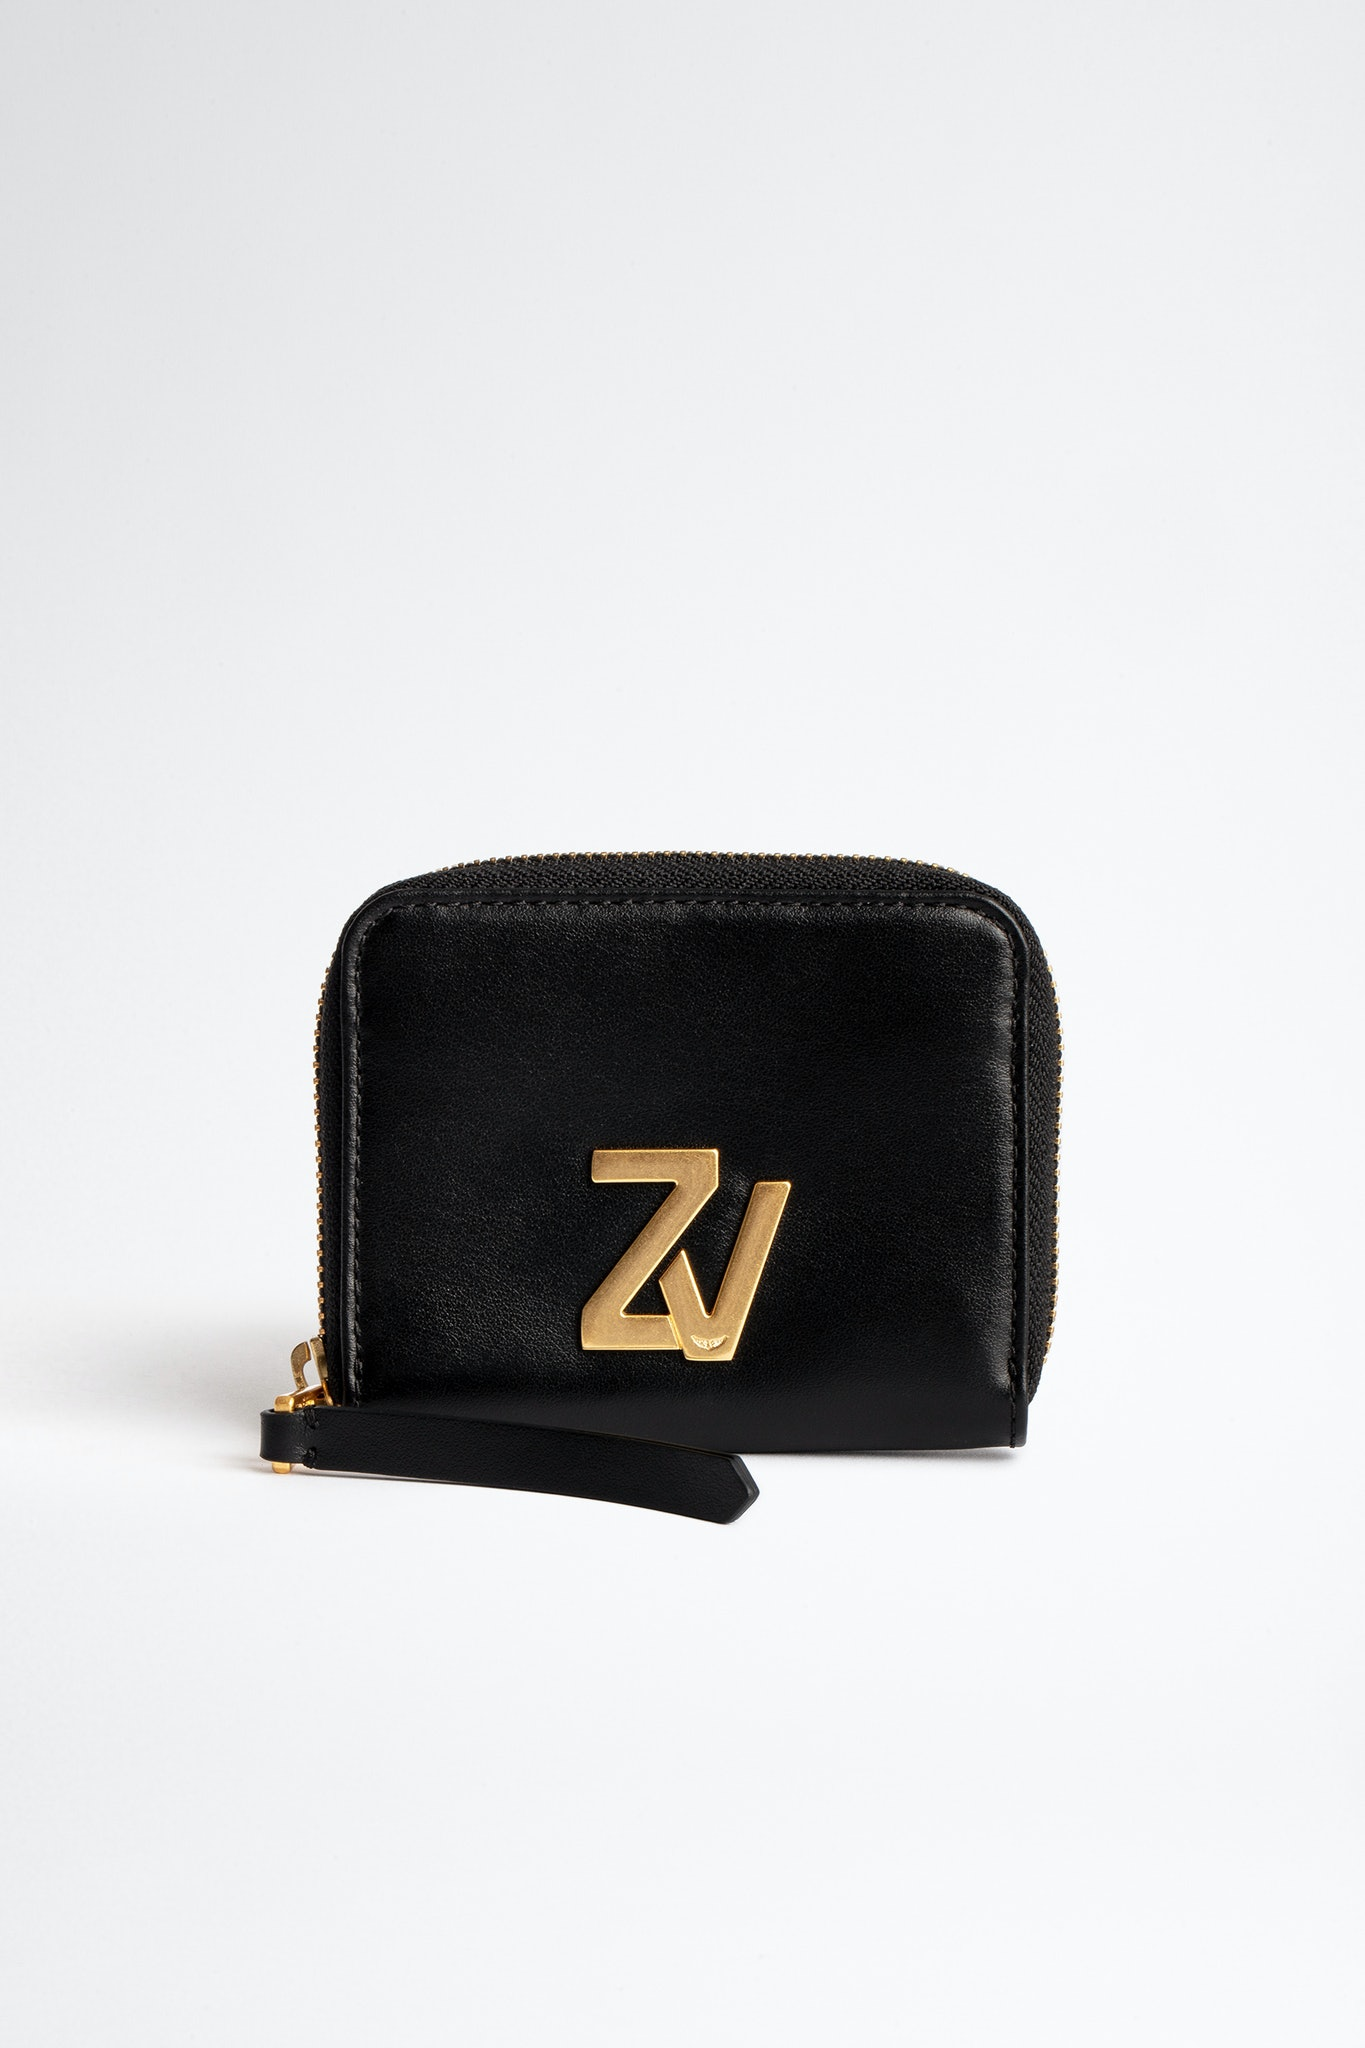 Portemonnaie ZV Initiale Le Compact